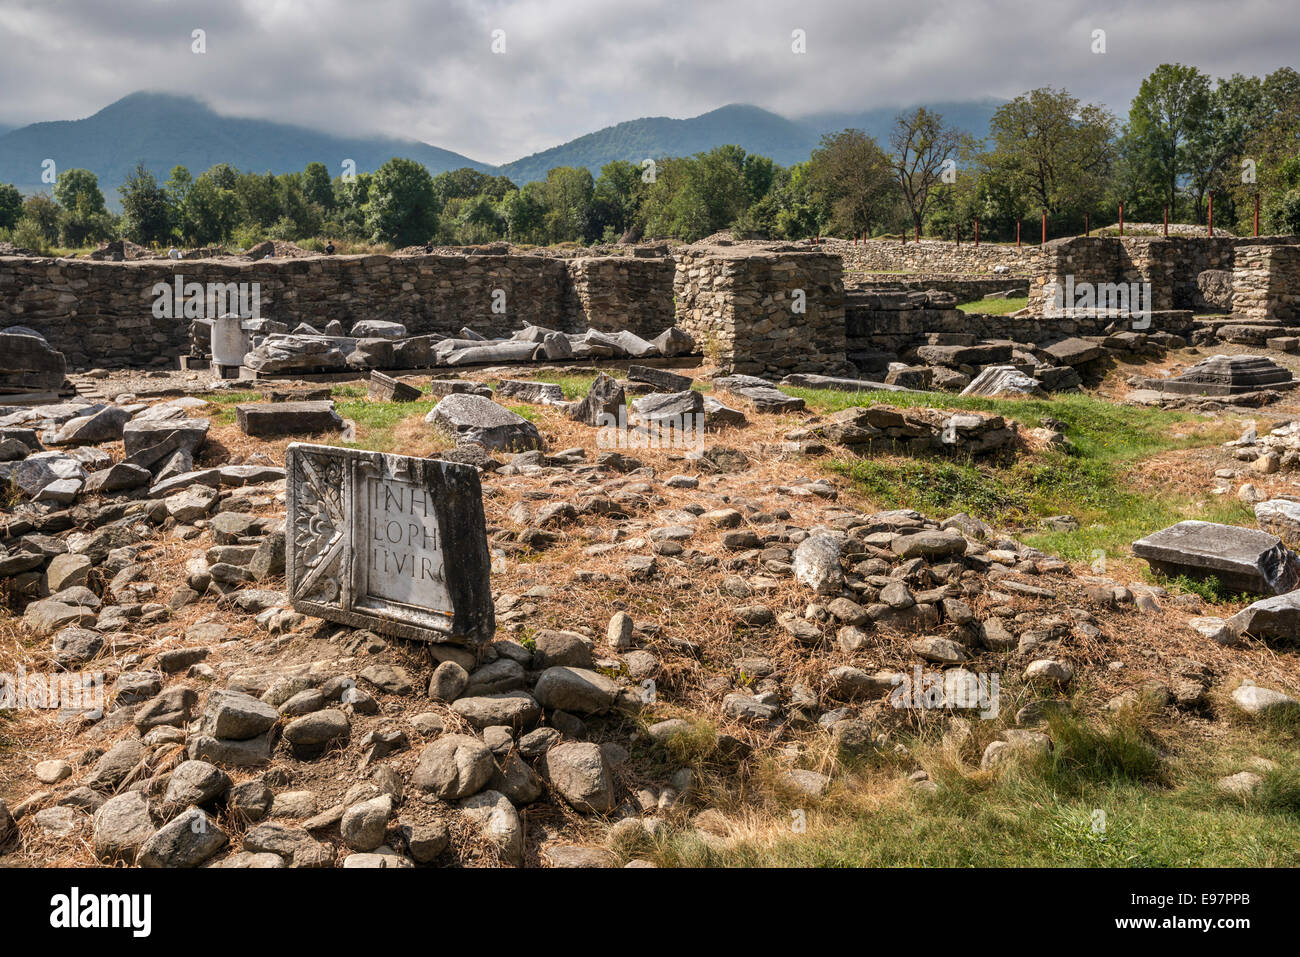 Forum section of Ulpia Traiana, 2nd century Roman Dacia city ruins in village of Sarmizegetusa, Transylvania, Romania Stock Photo